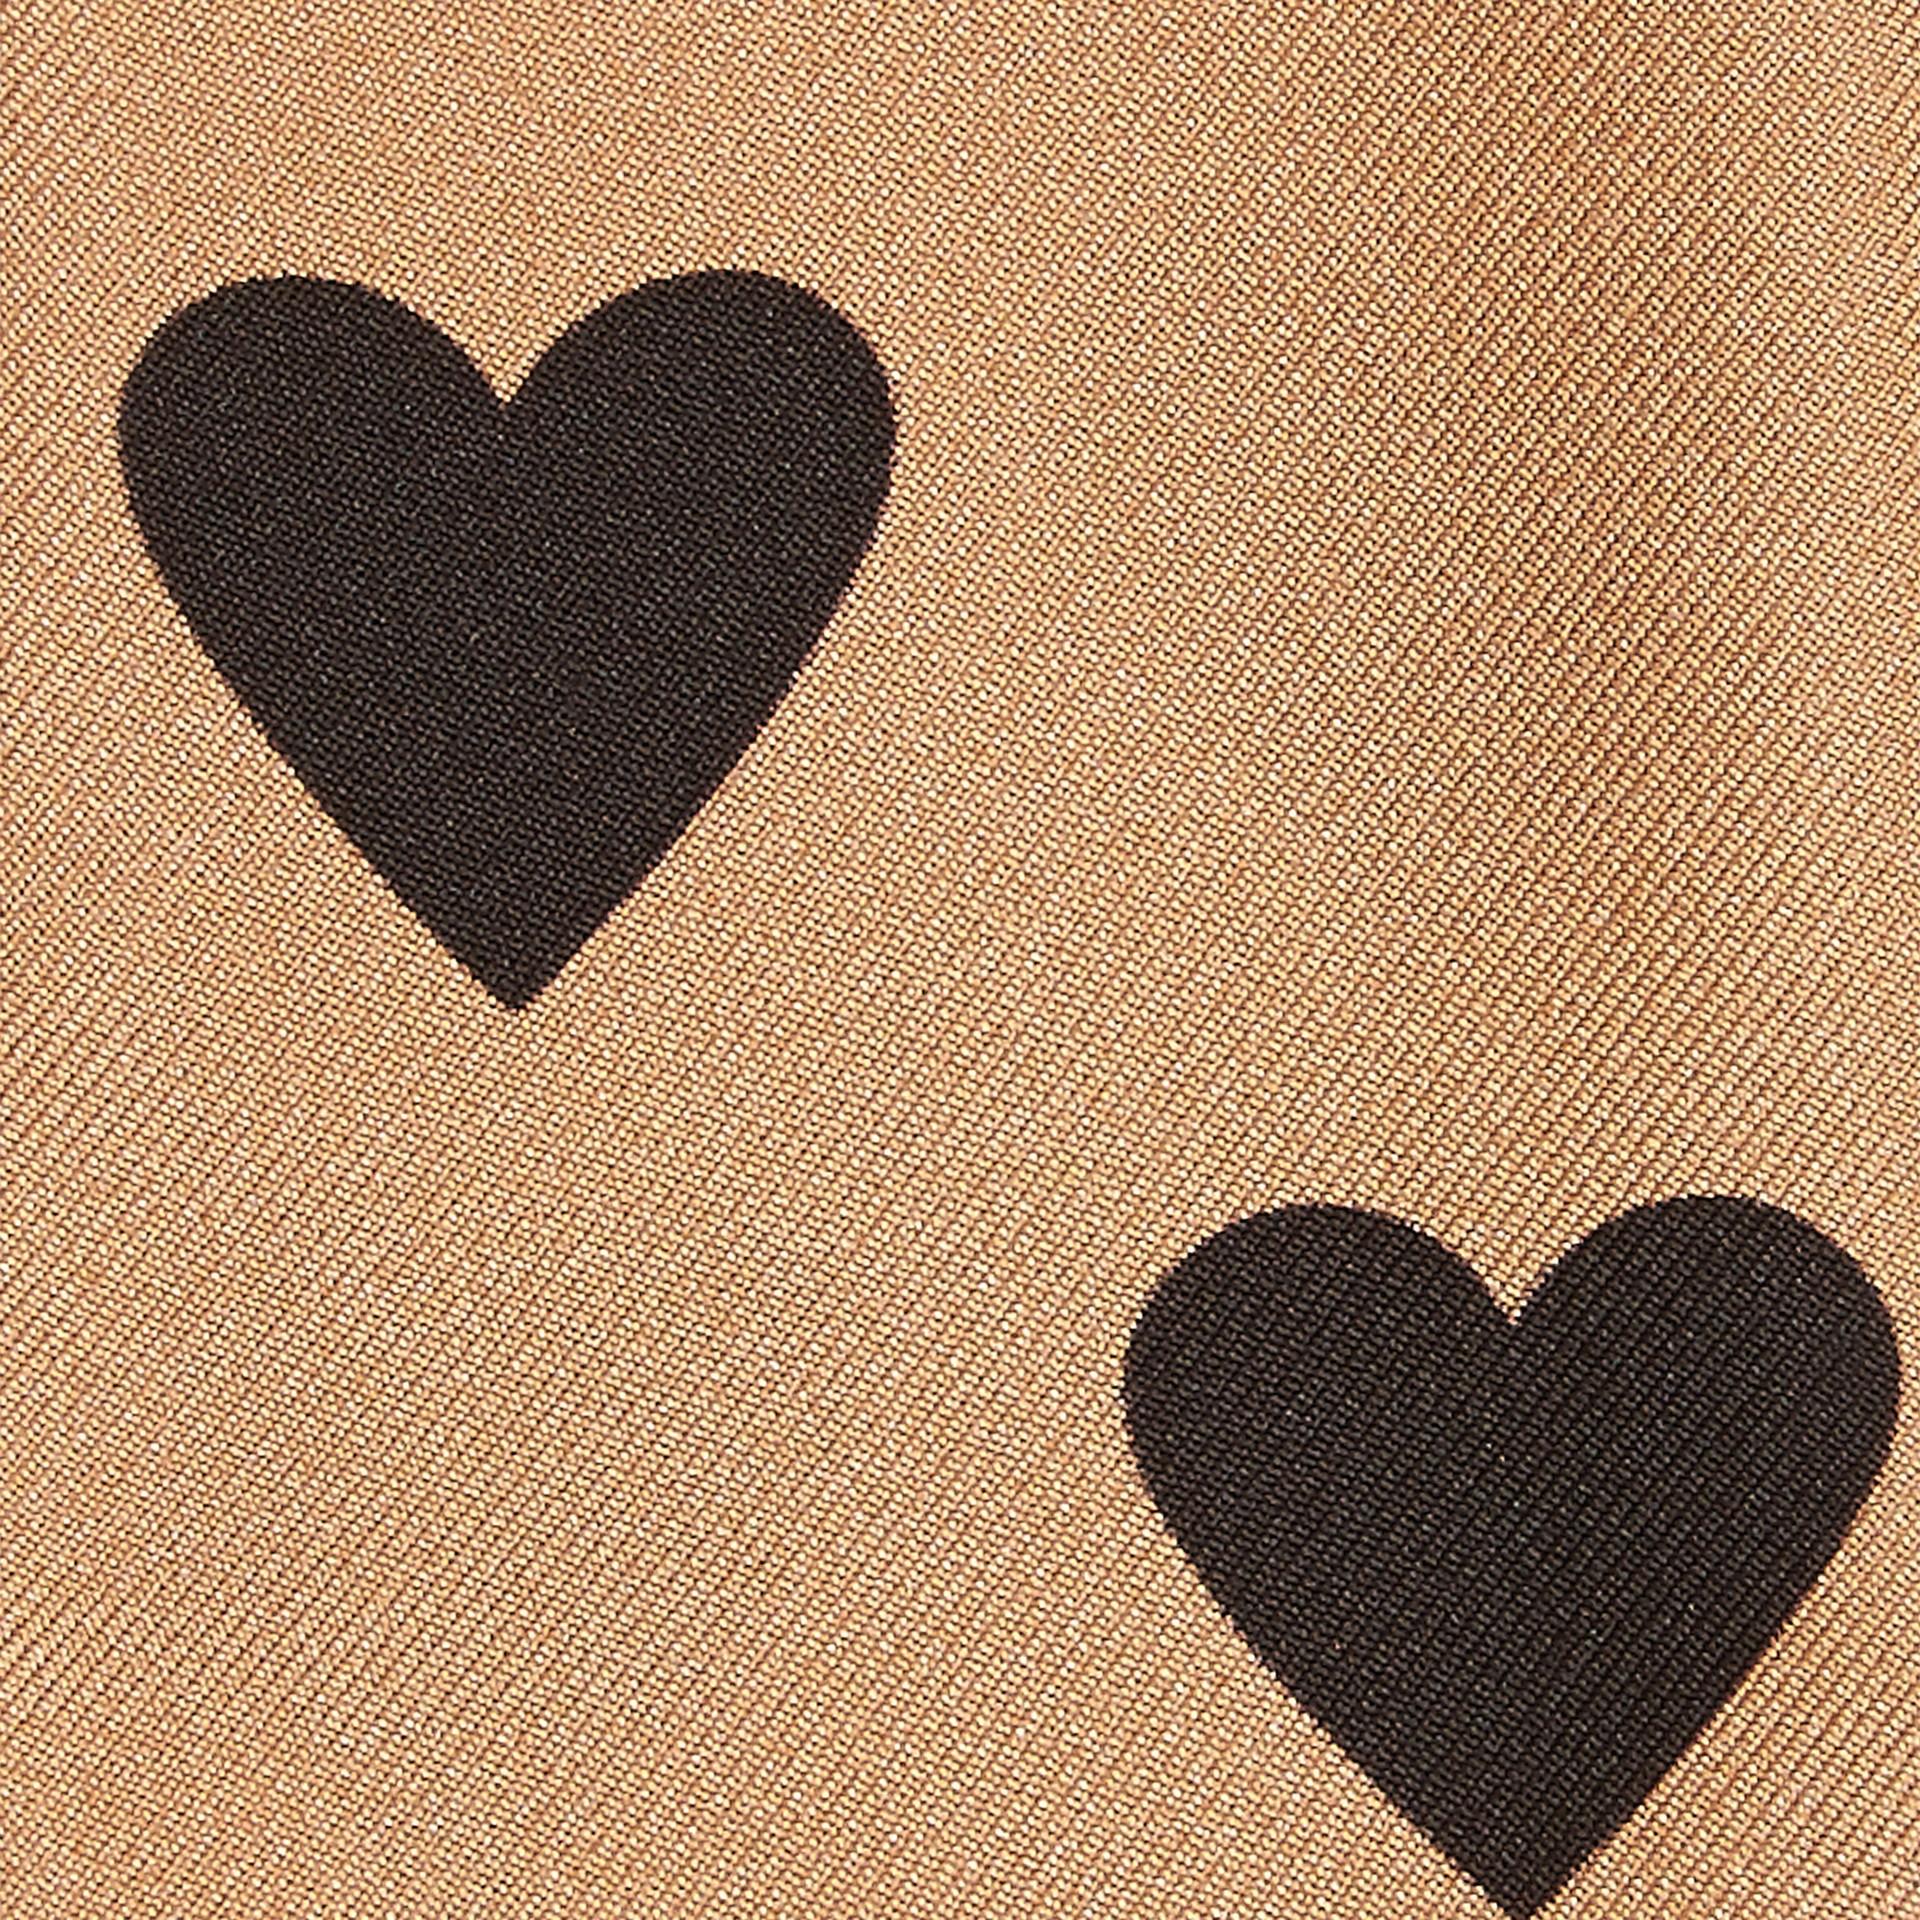 Camel/black Heart Print Slim Silk Scarf Camel/black - gallery image 2